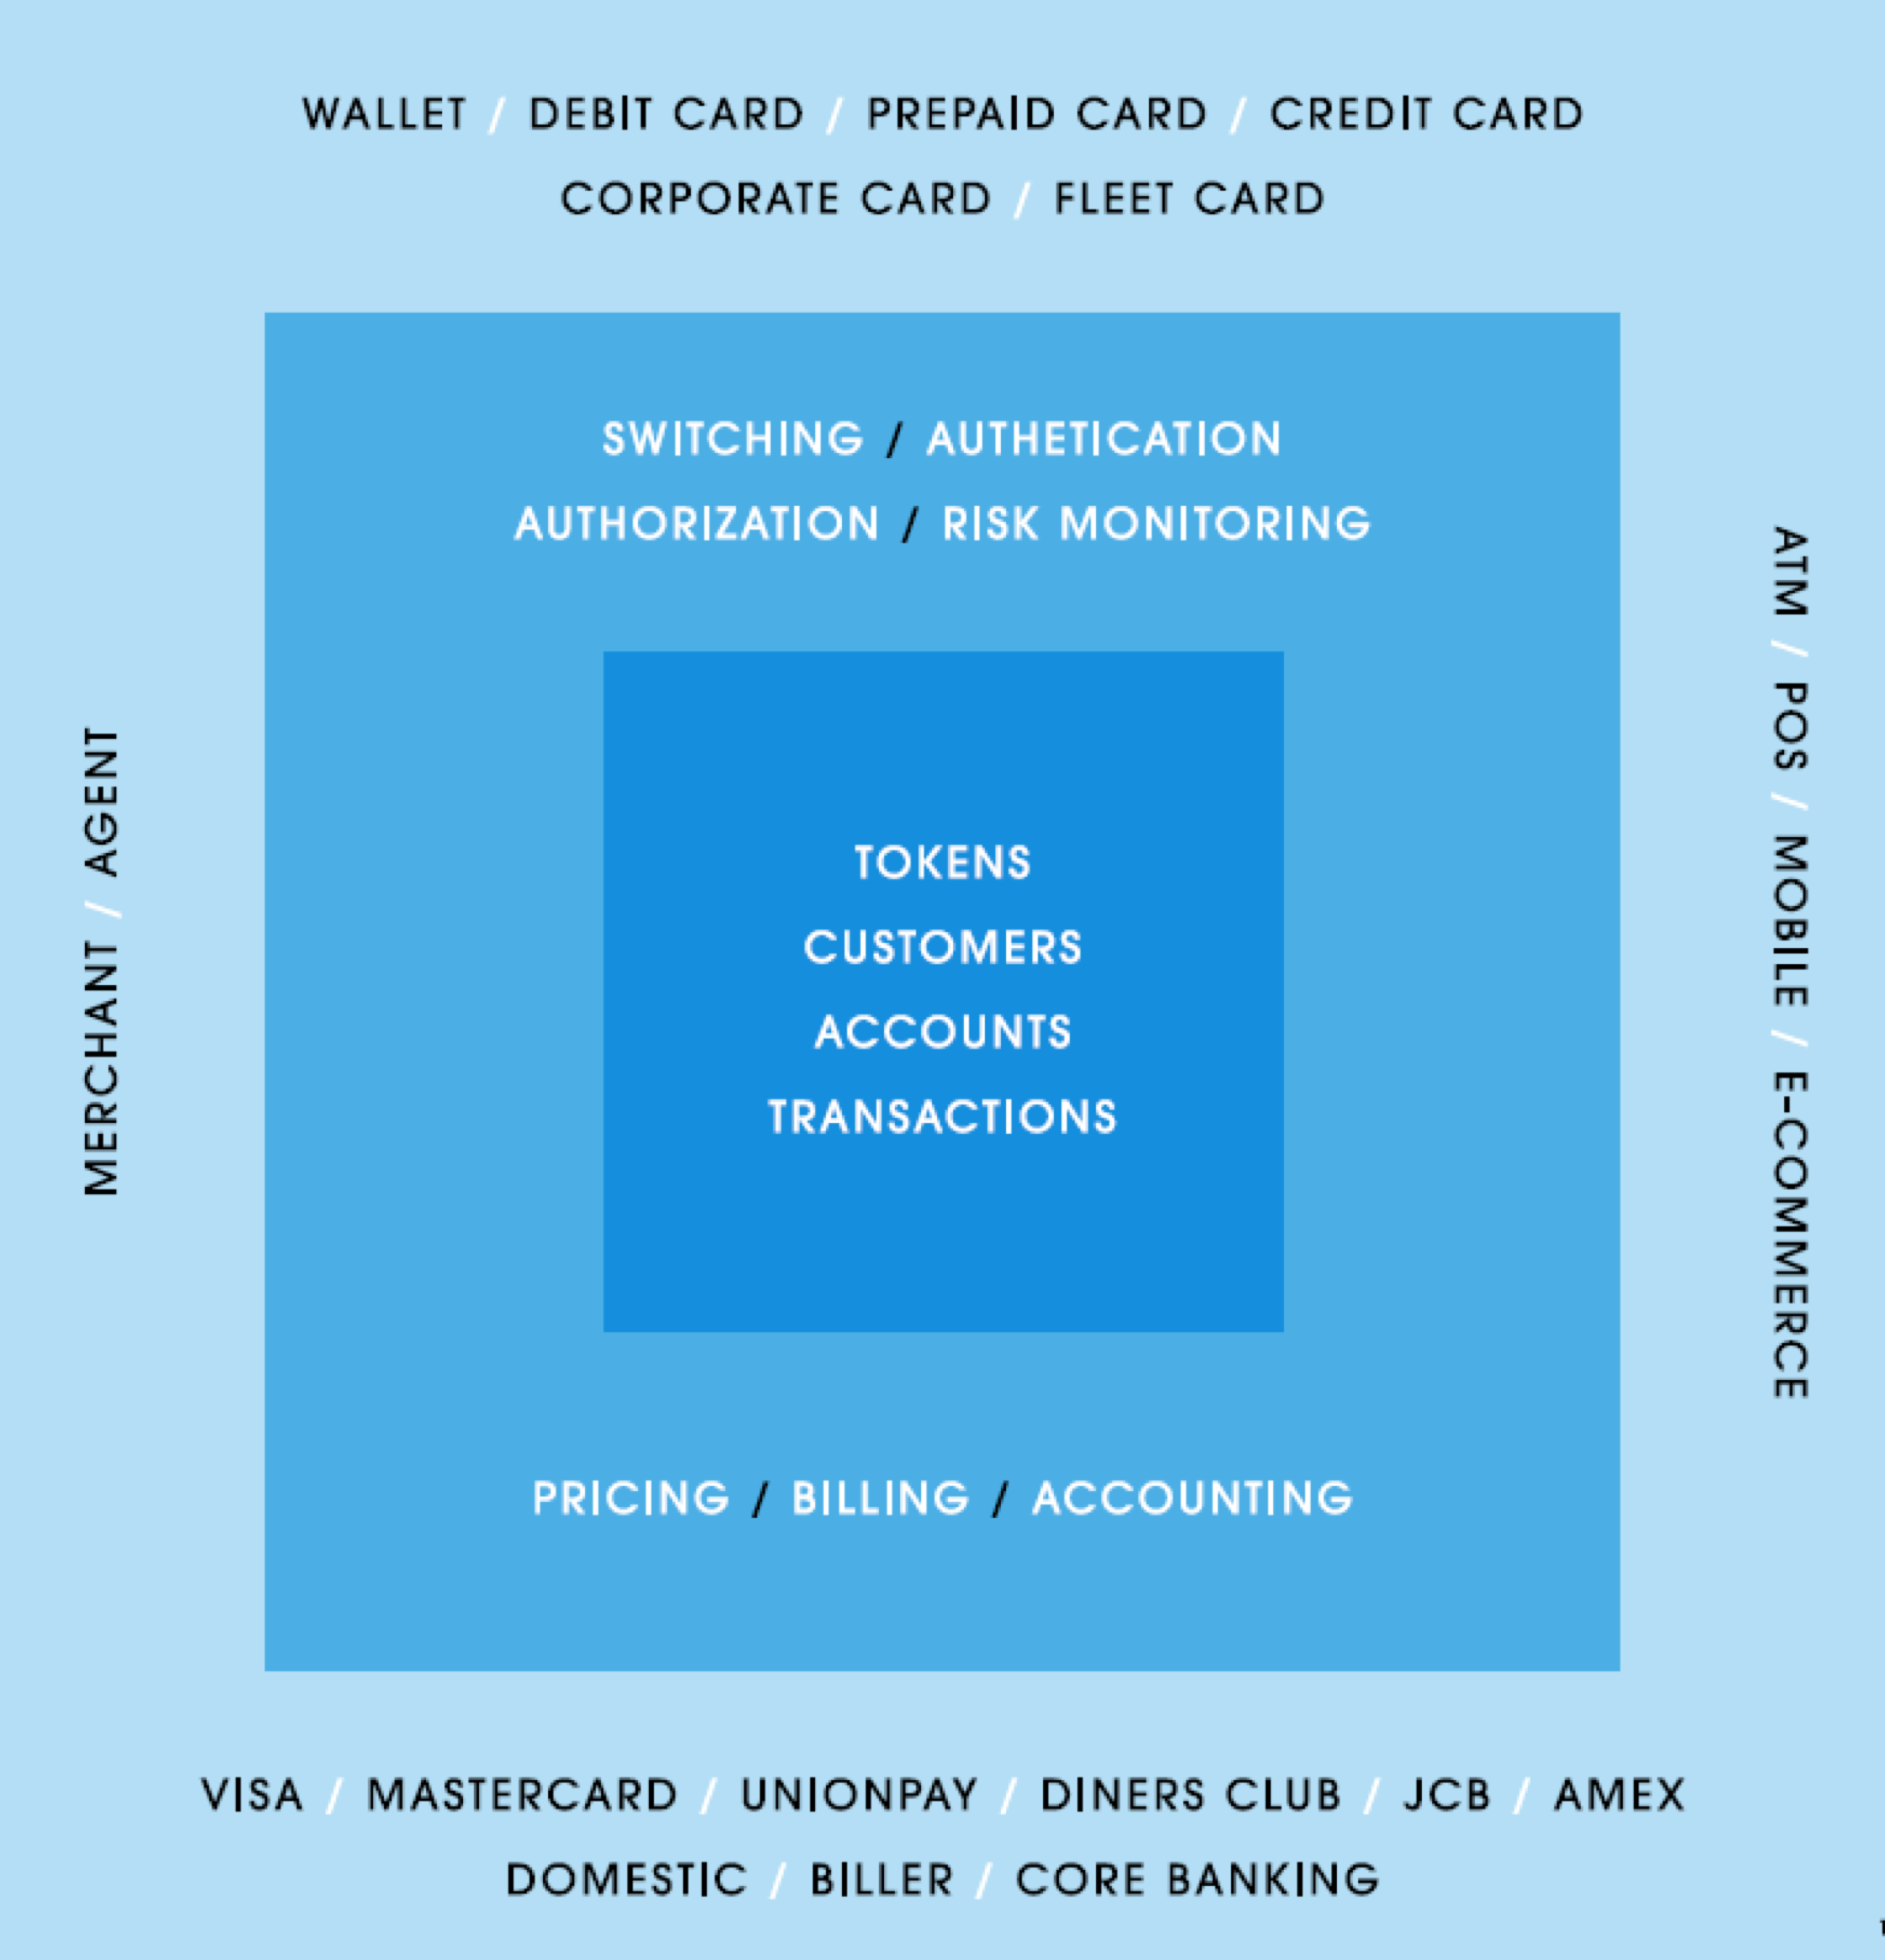 WAY4_Digital_Payment_Platform_Business_View.png